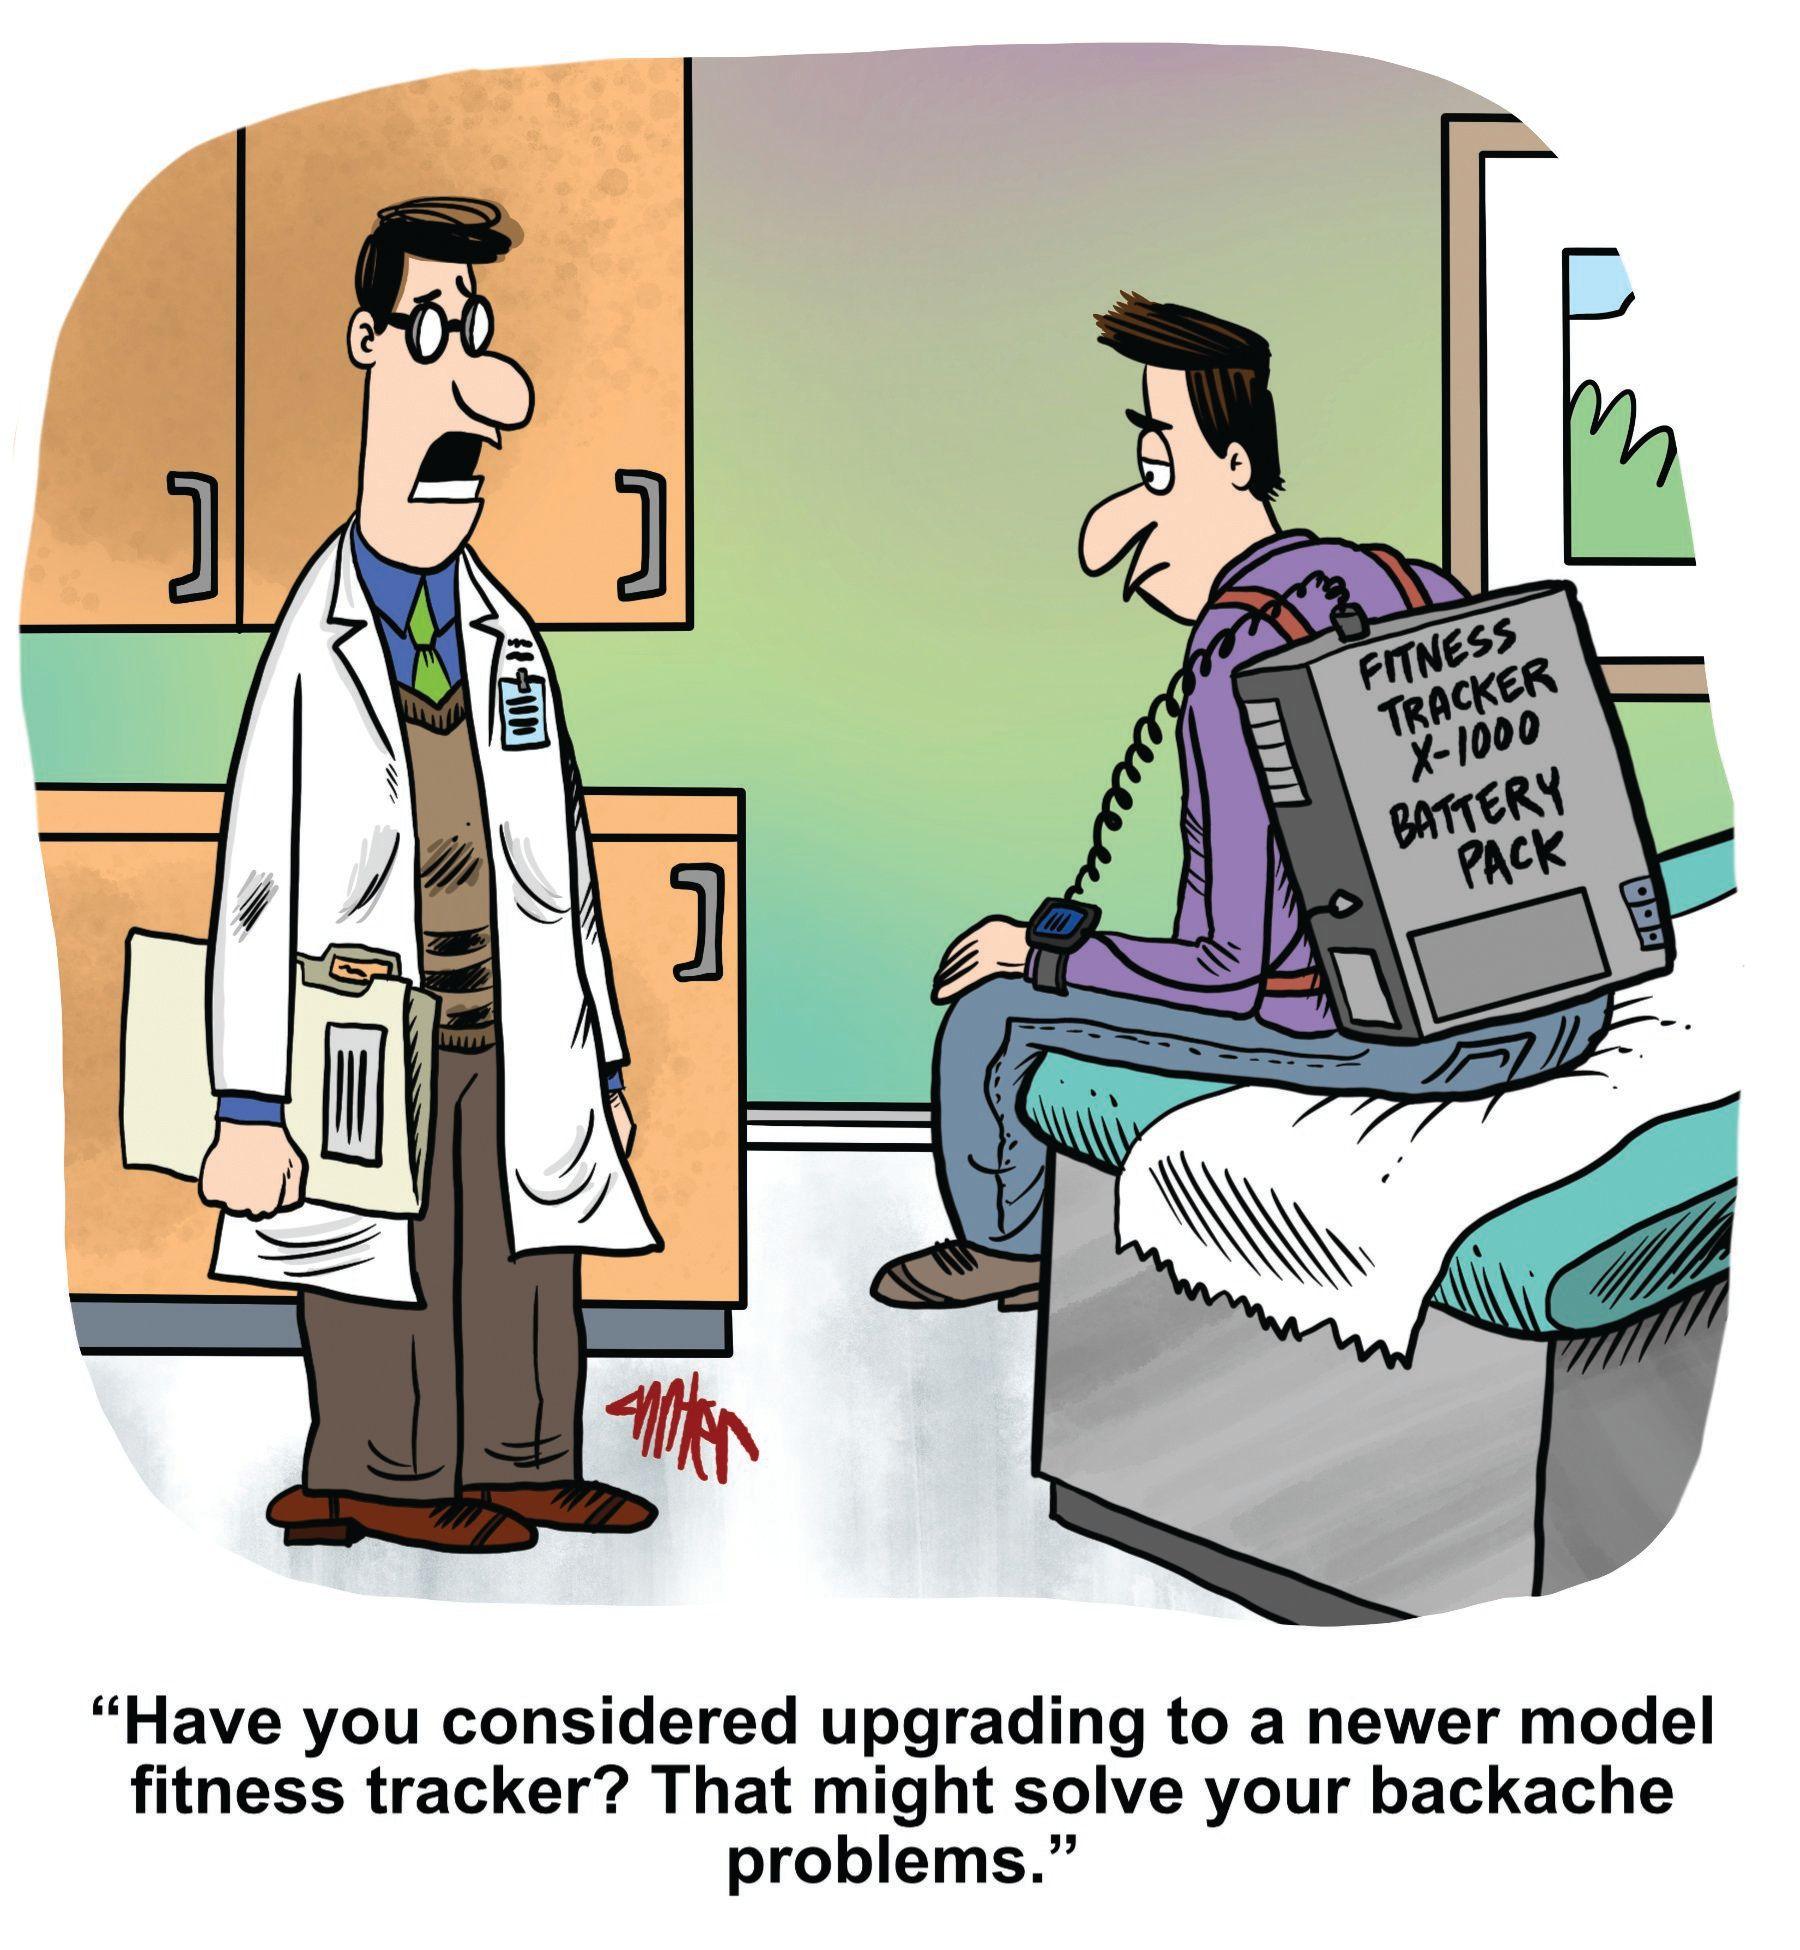 Medical Economics cartoon: The old fitness tracker